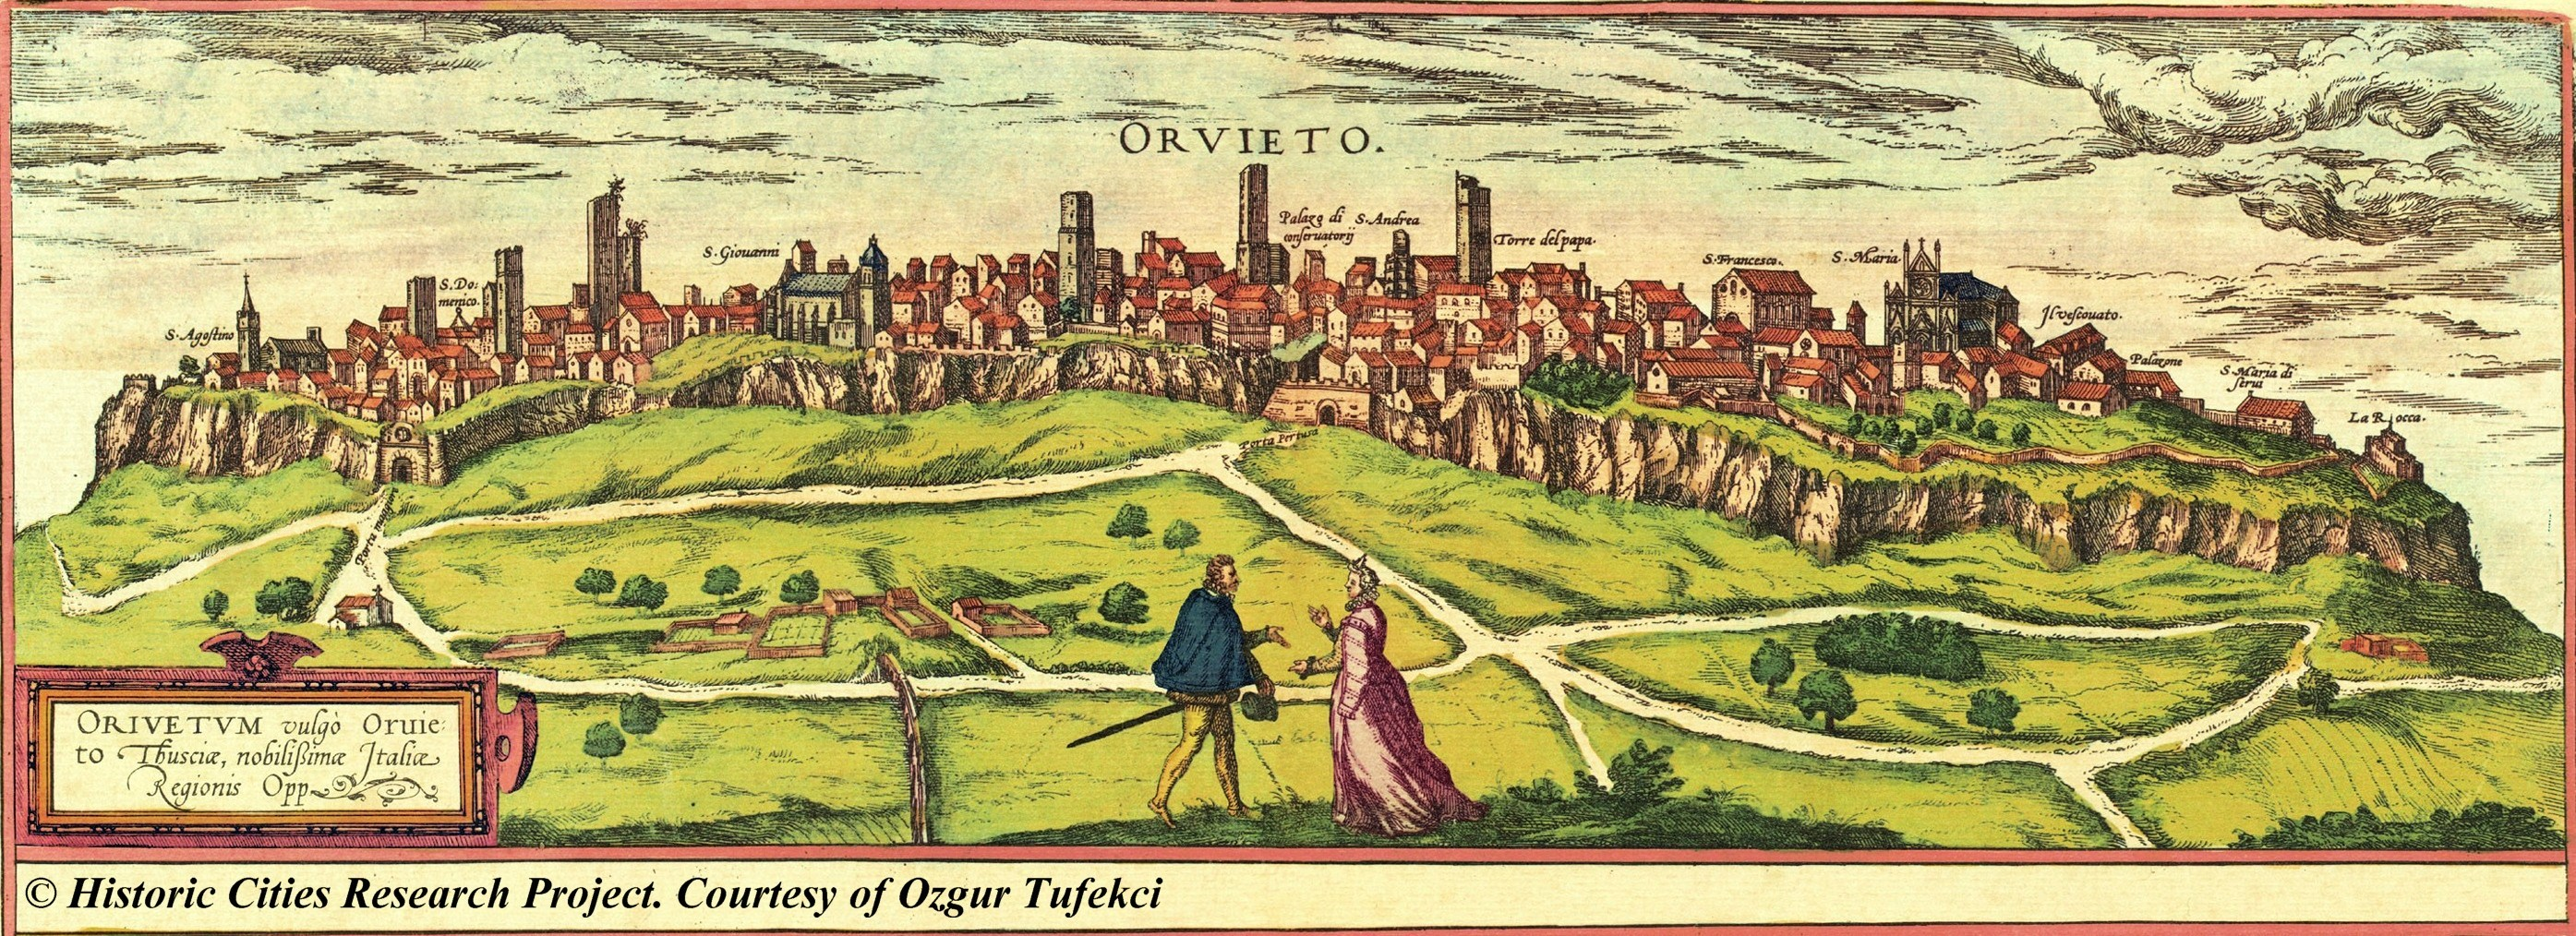 maps-of-medieval-cities-orvieto